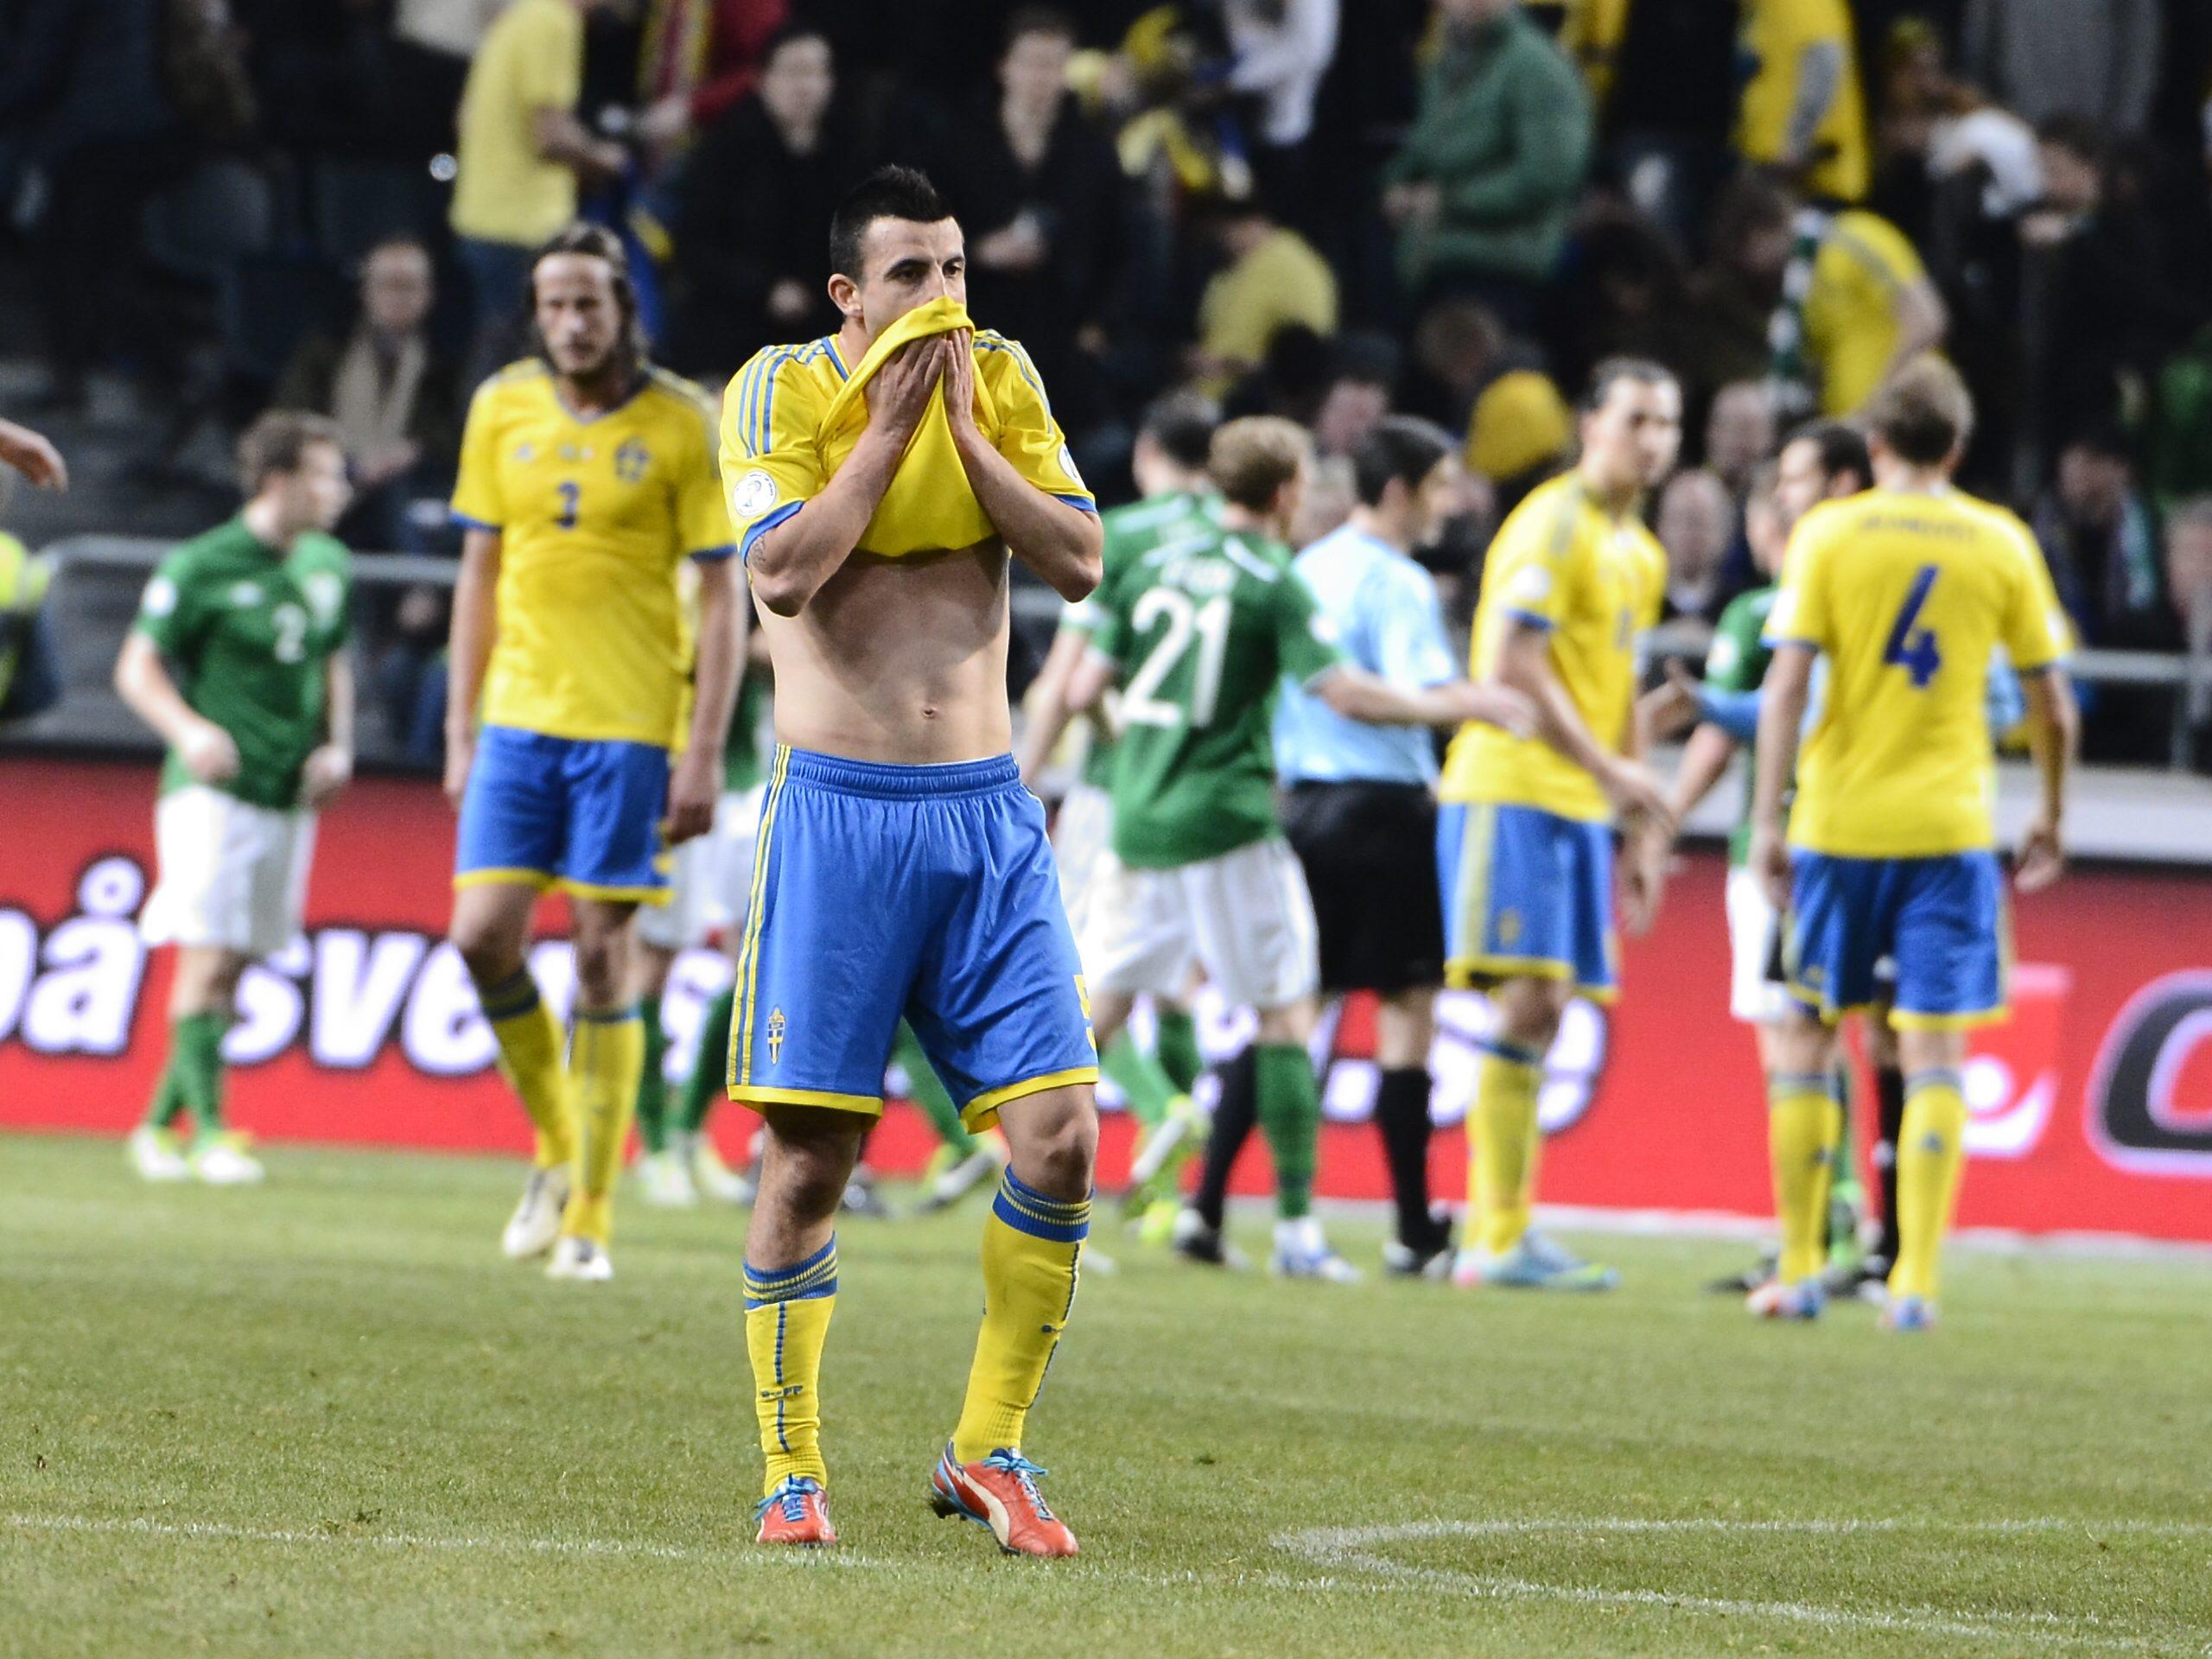 Sverige spelade oavgjort mot Irland. Foto: Claudio Bresciani/Scanpix.